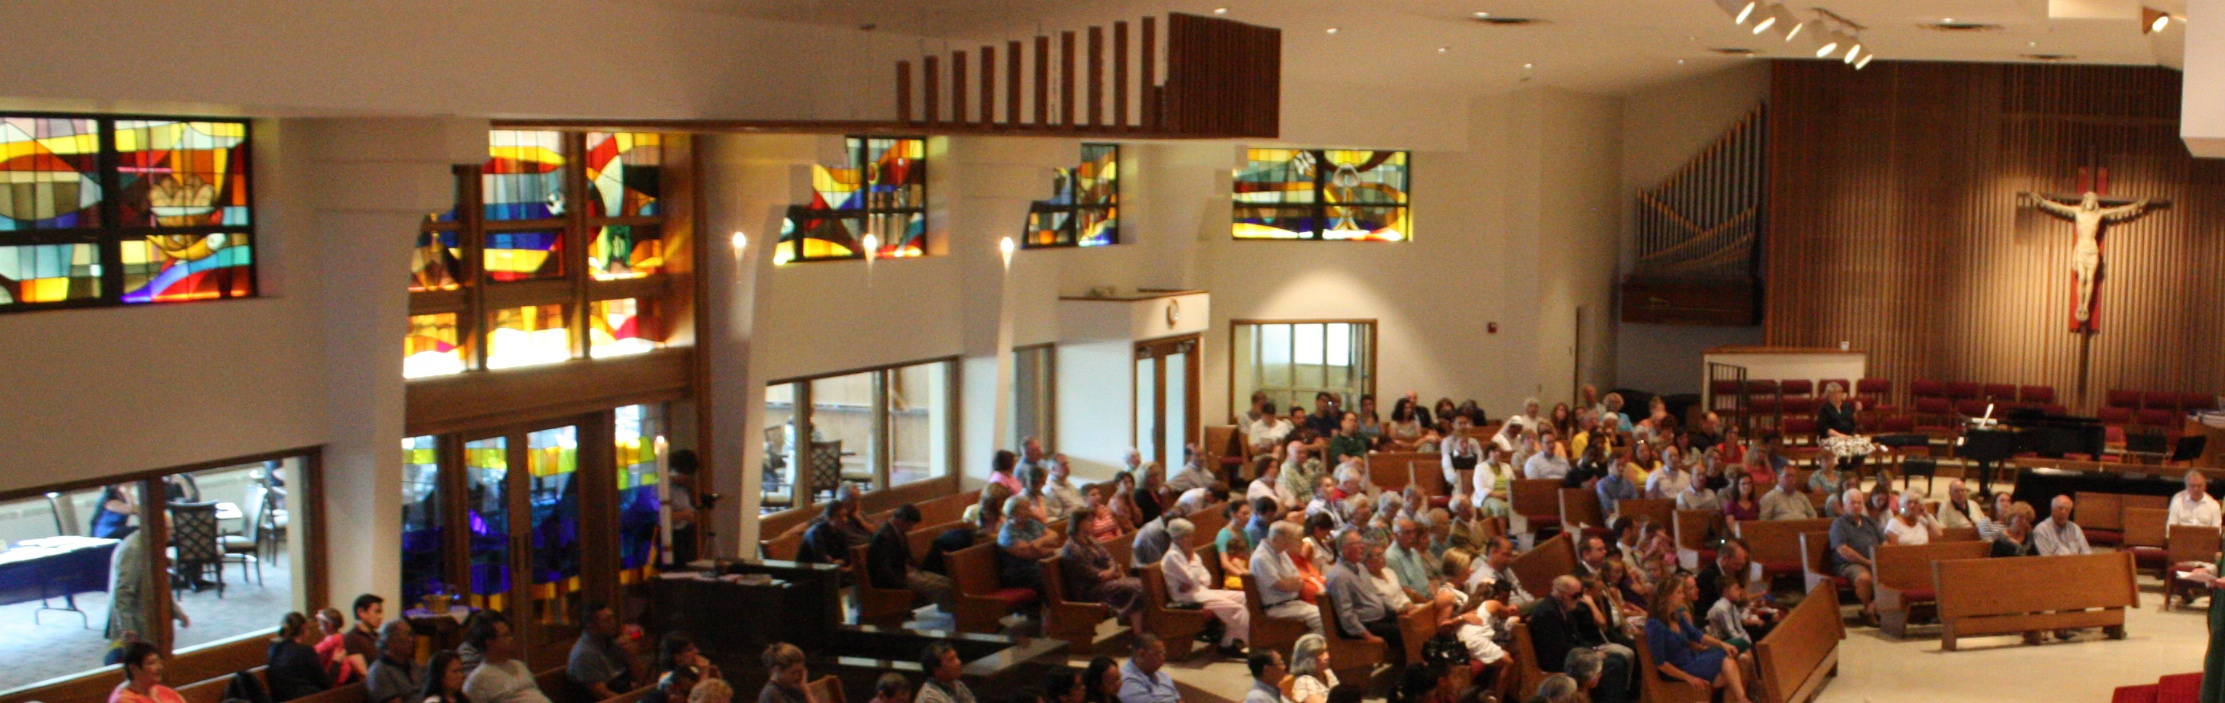 parish cropped for blog.jpg